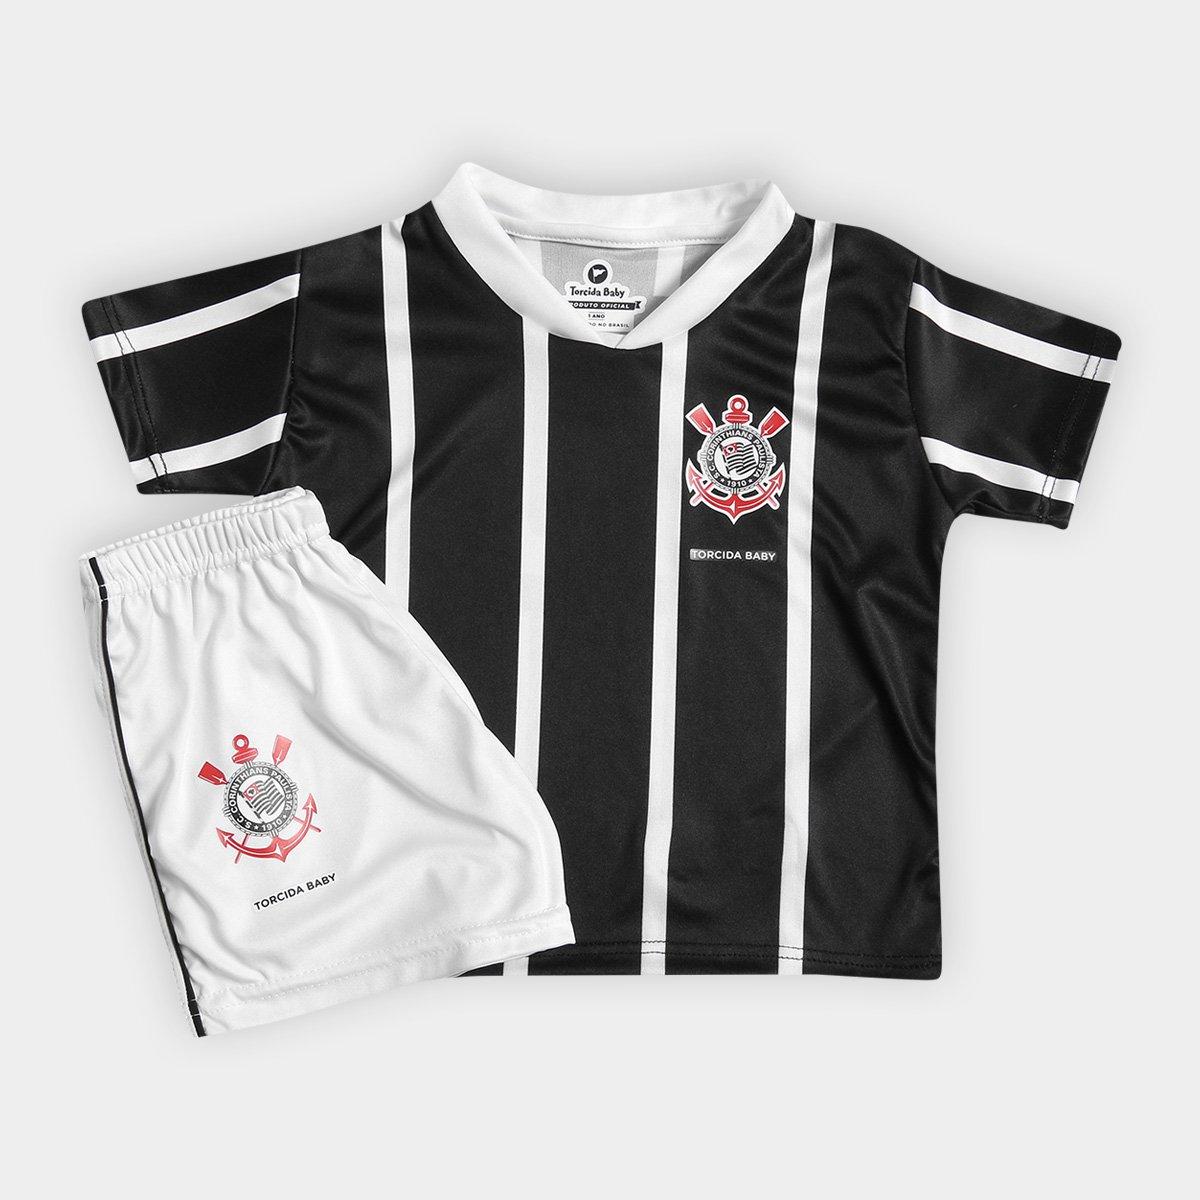 315bc9eac4 Conjunto Corinthians Infantil Torcida Baby - Compre Agora